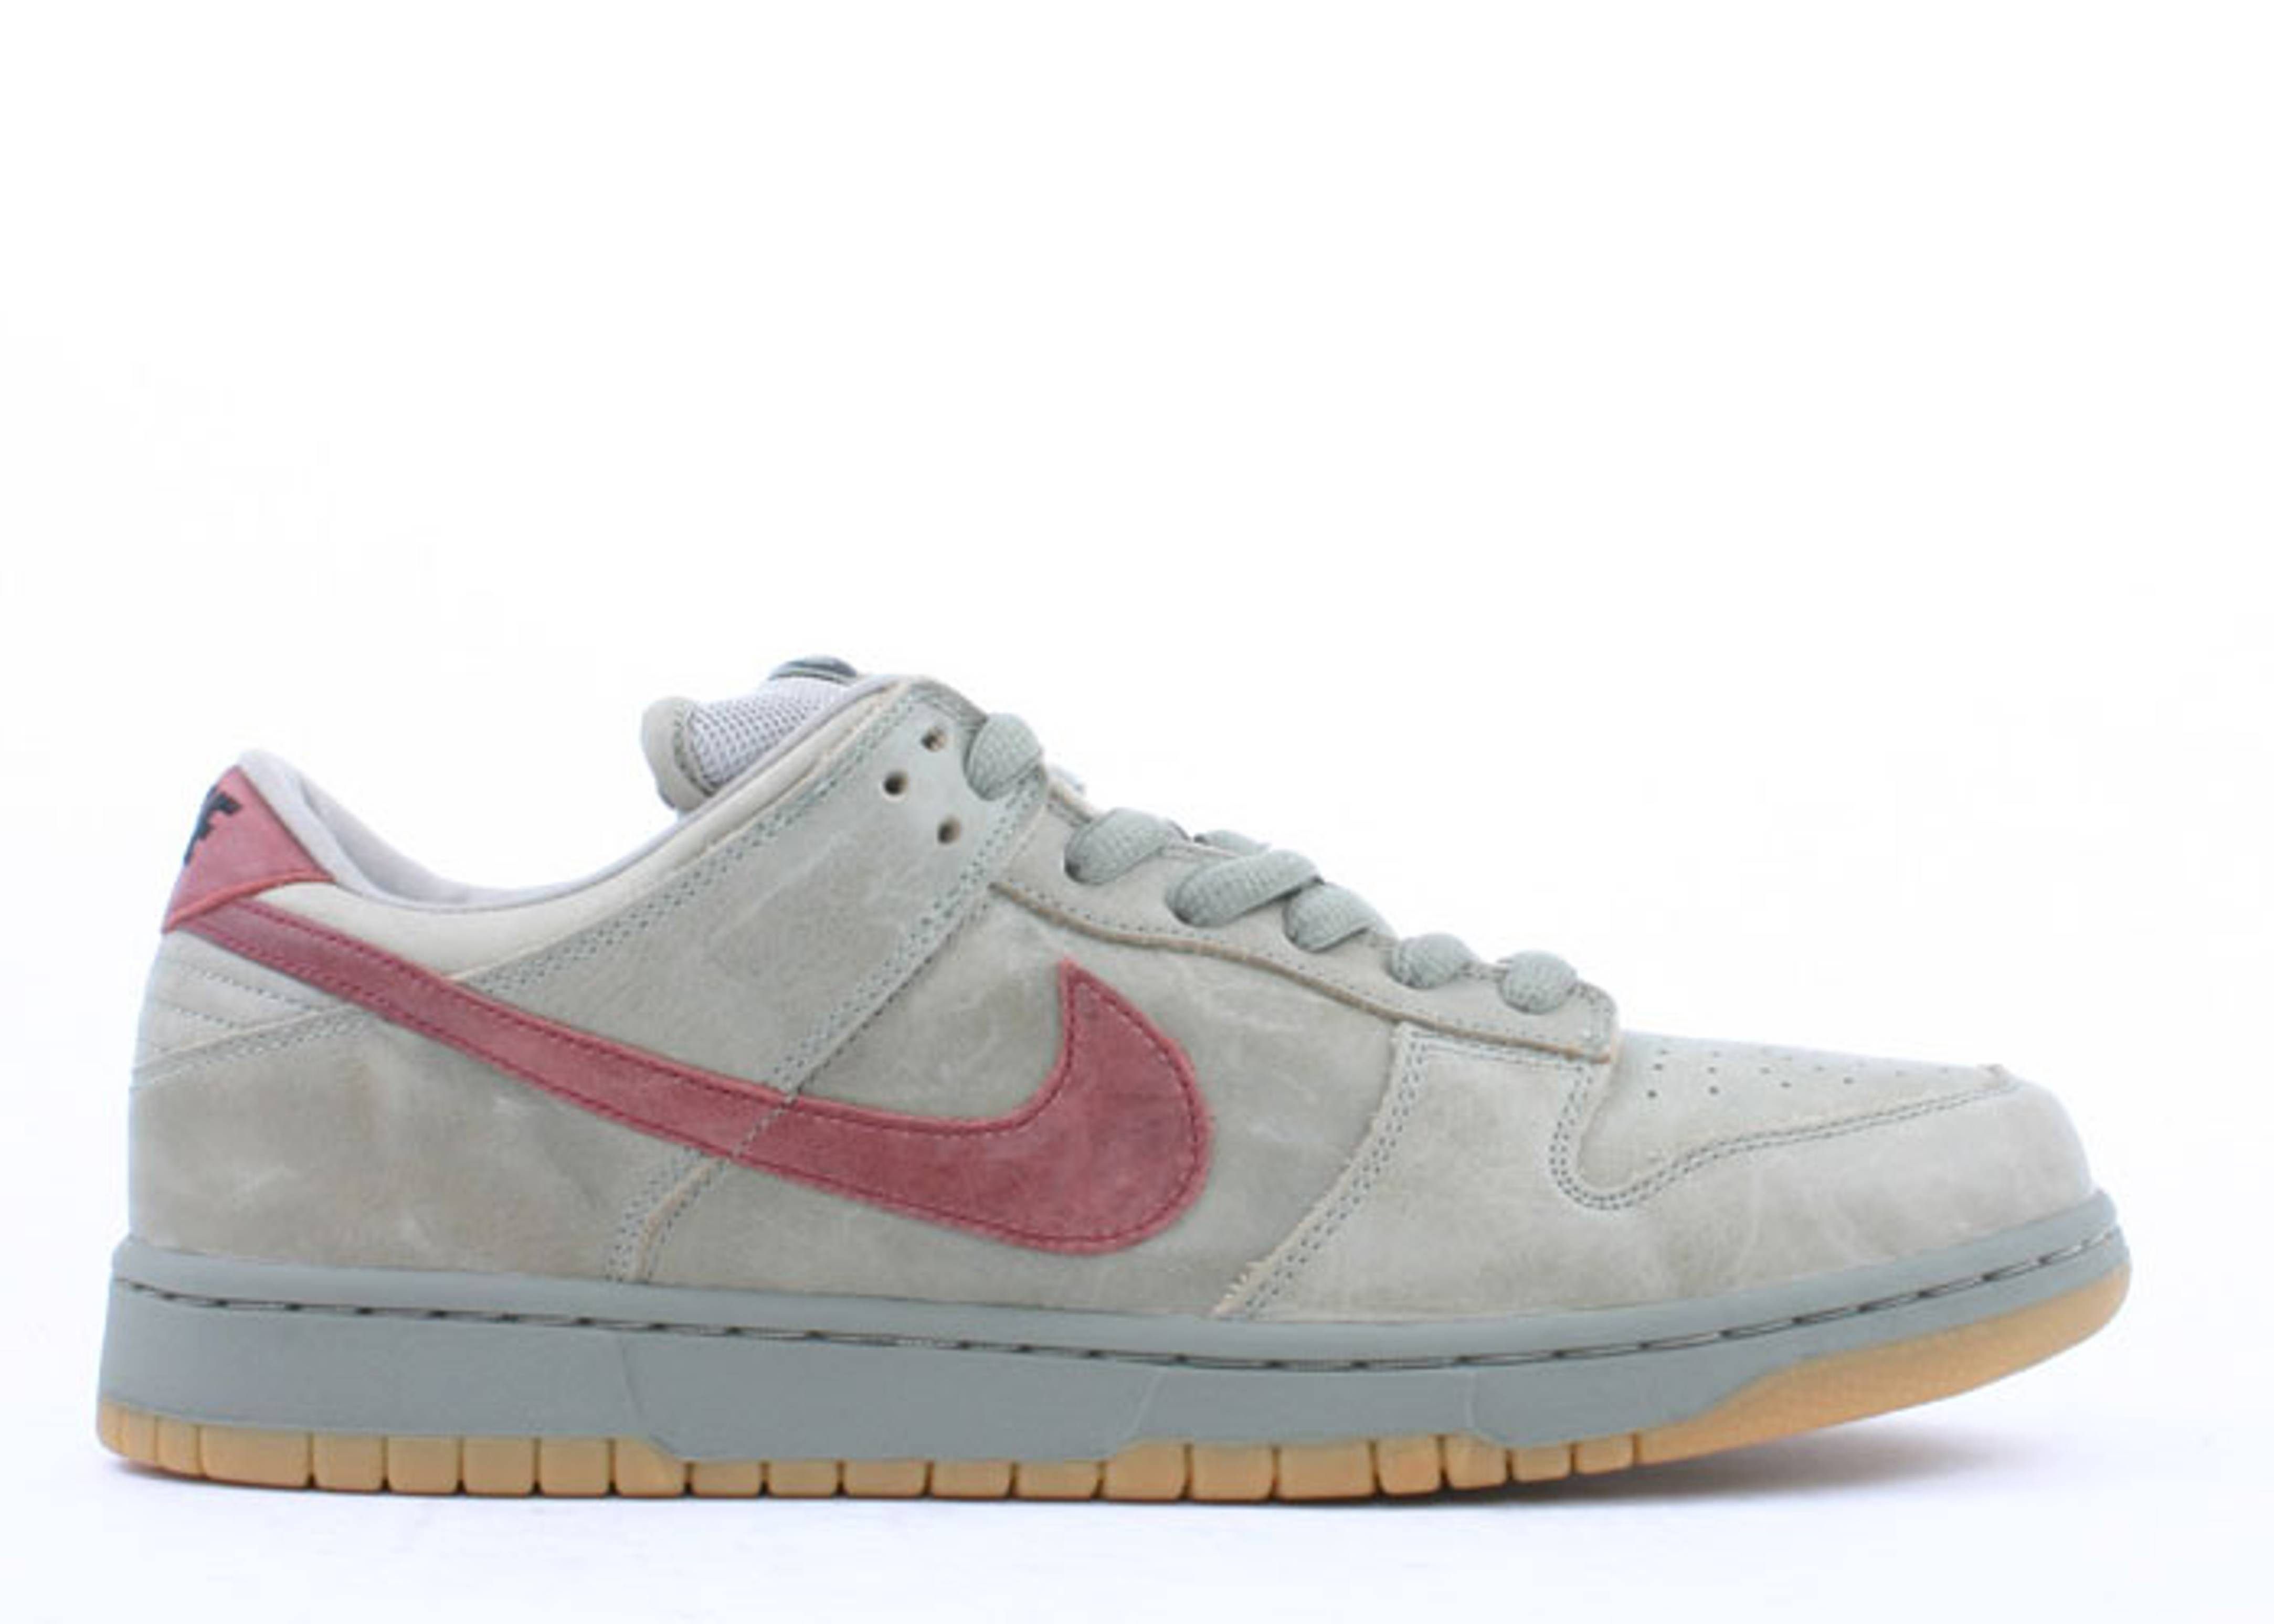 best sneakers bff0e 756a9 dunk low pro sb